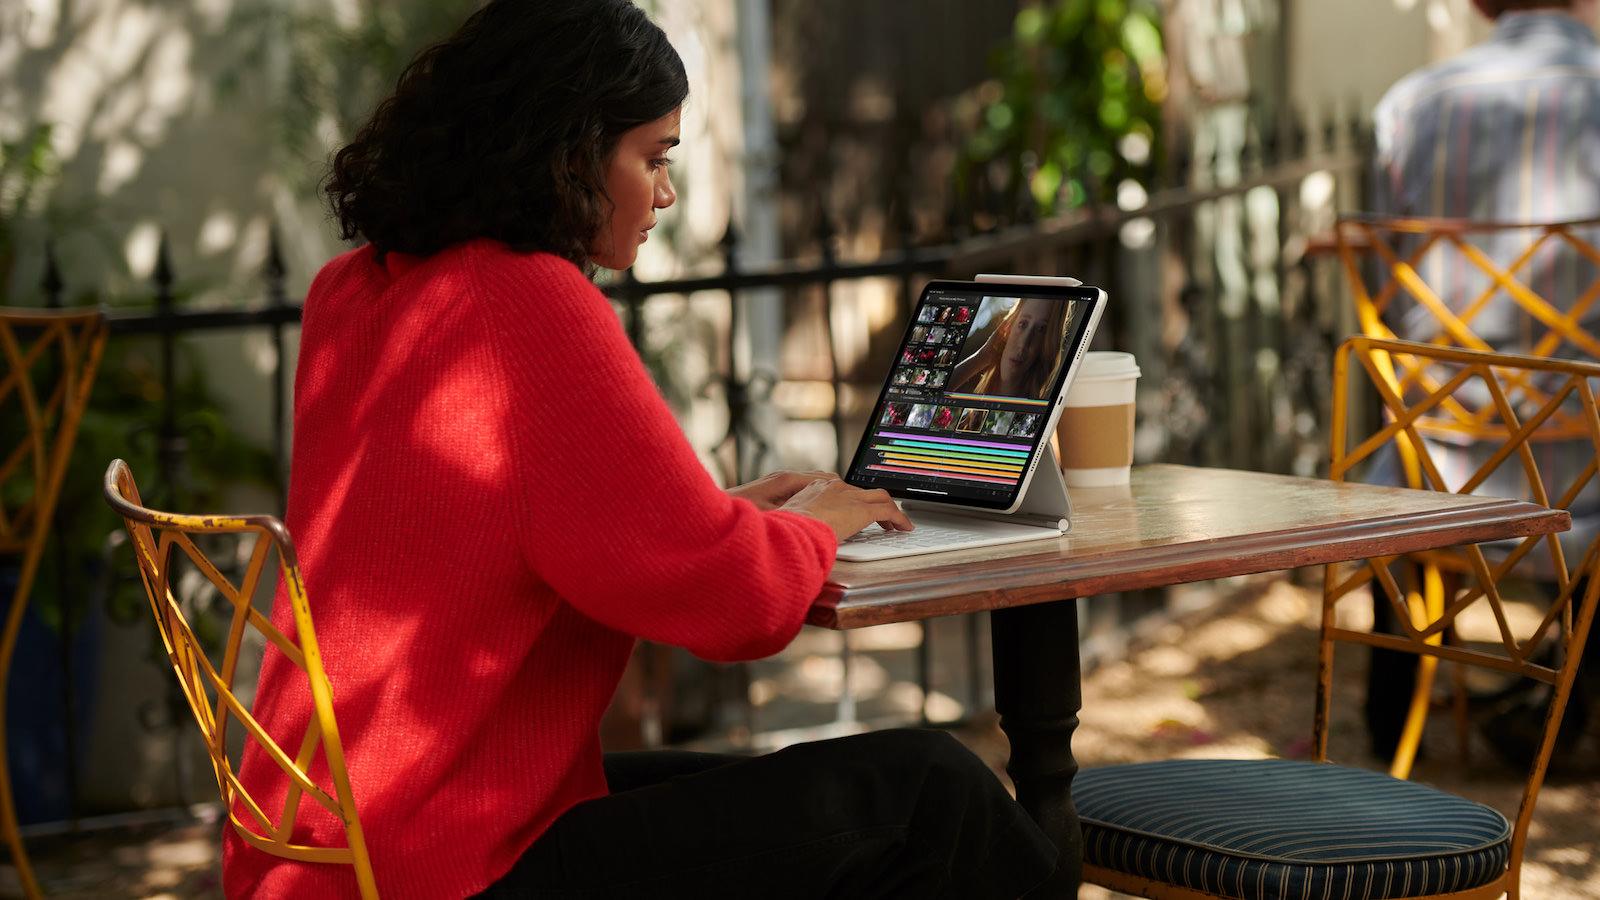 Apple ipad pro spring21 5g connectivity 04202021